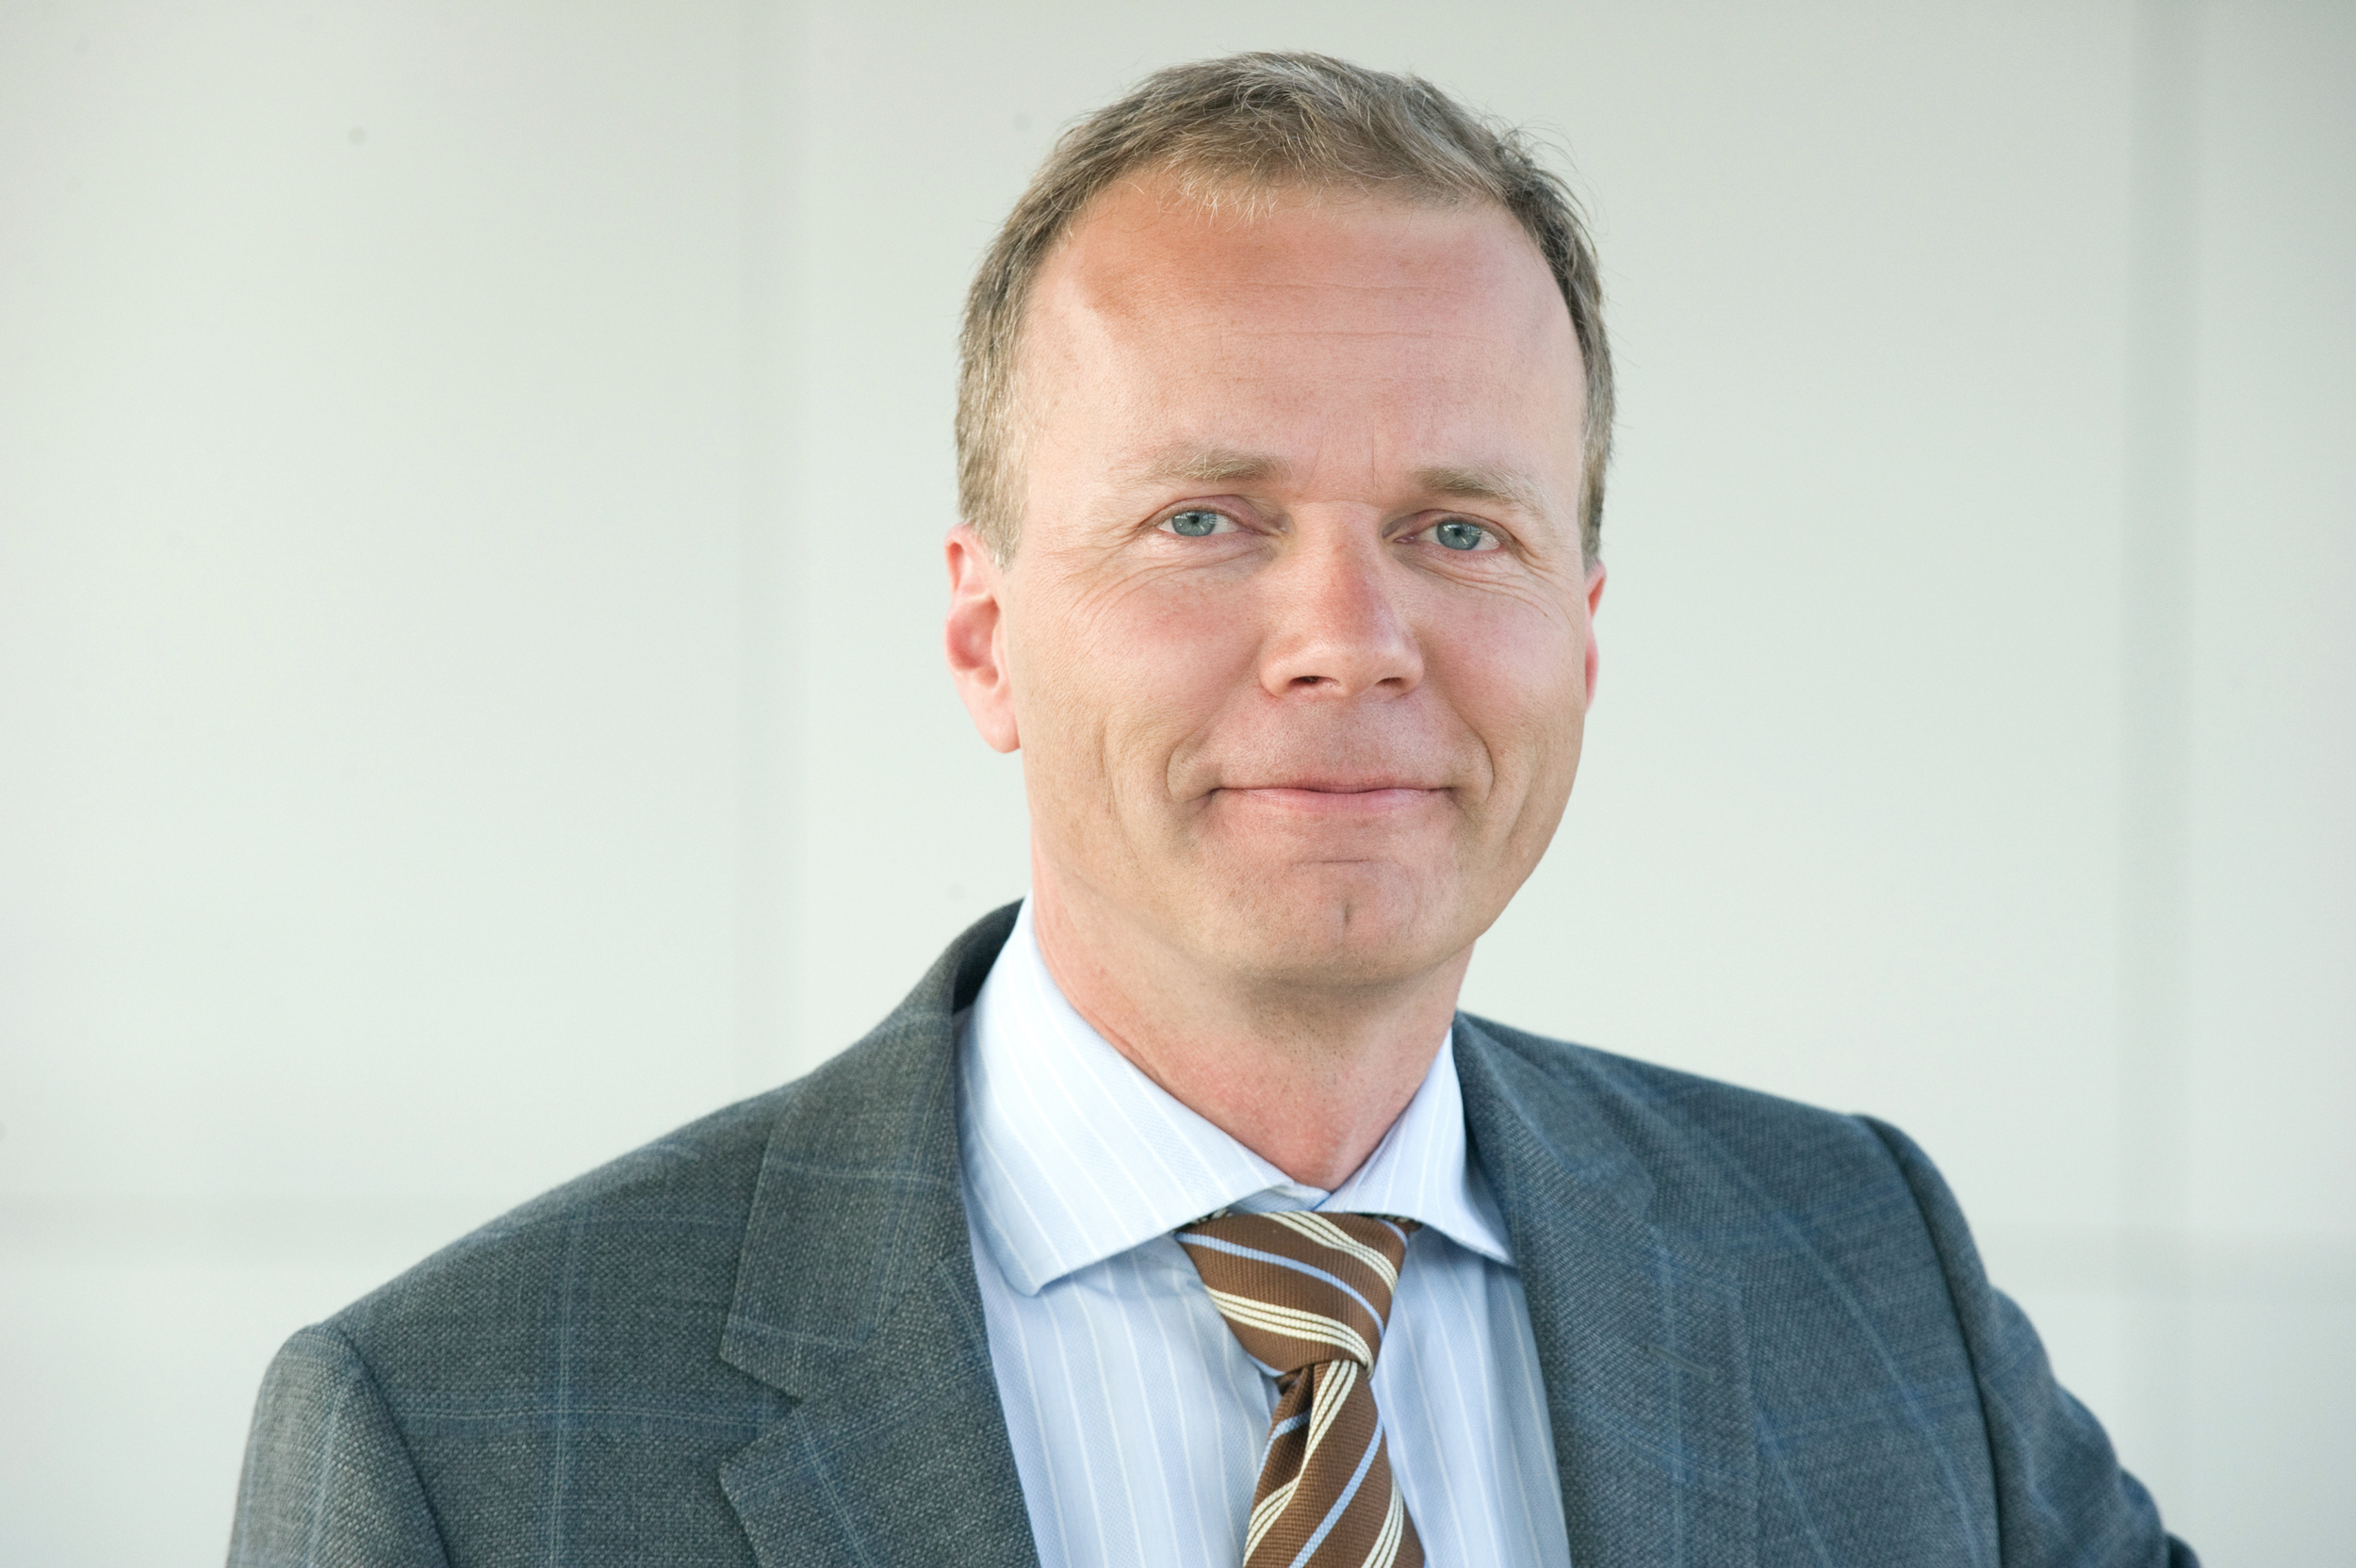 Christian Krüger (Welltec)